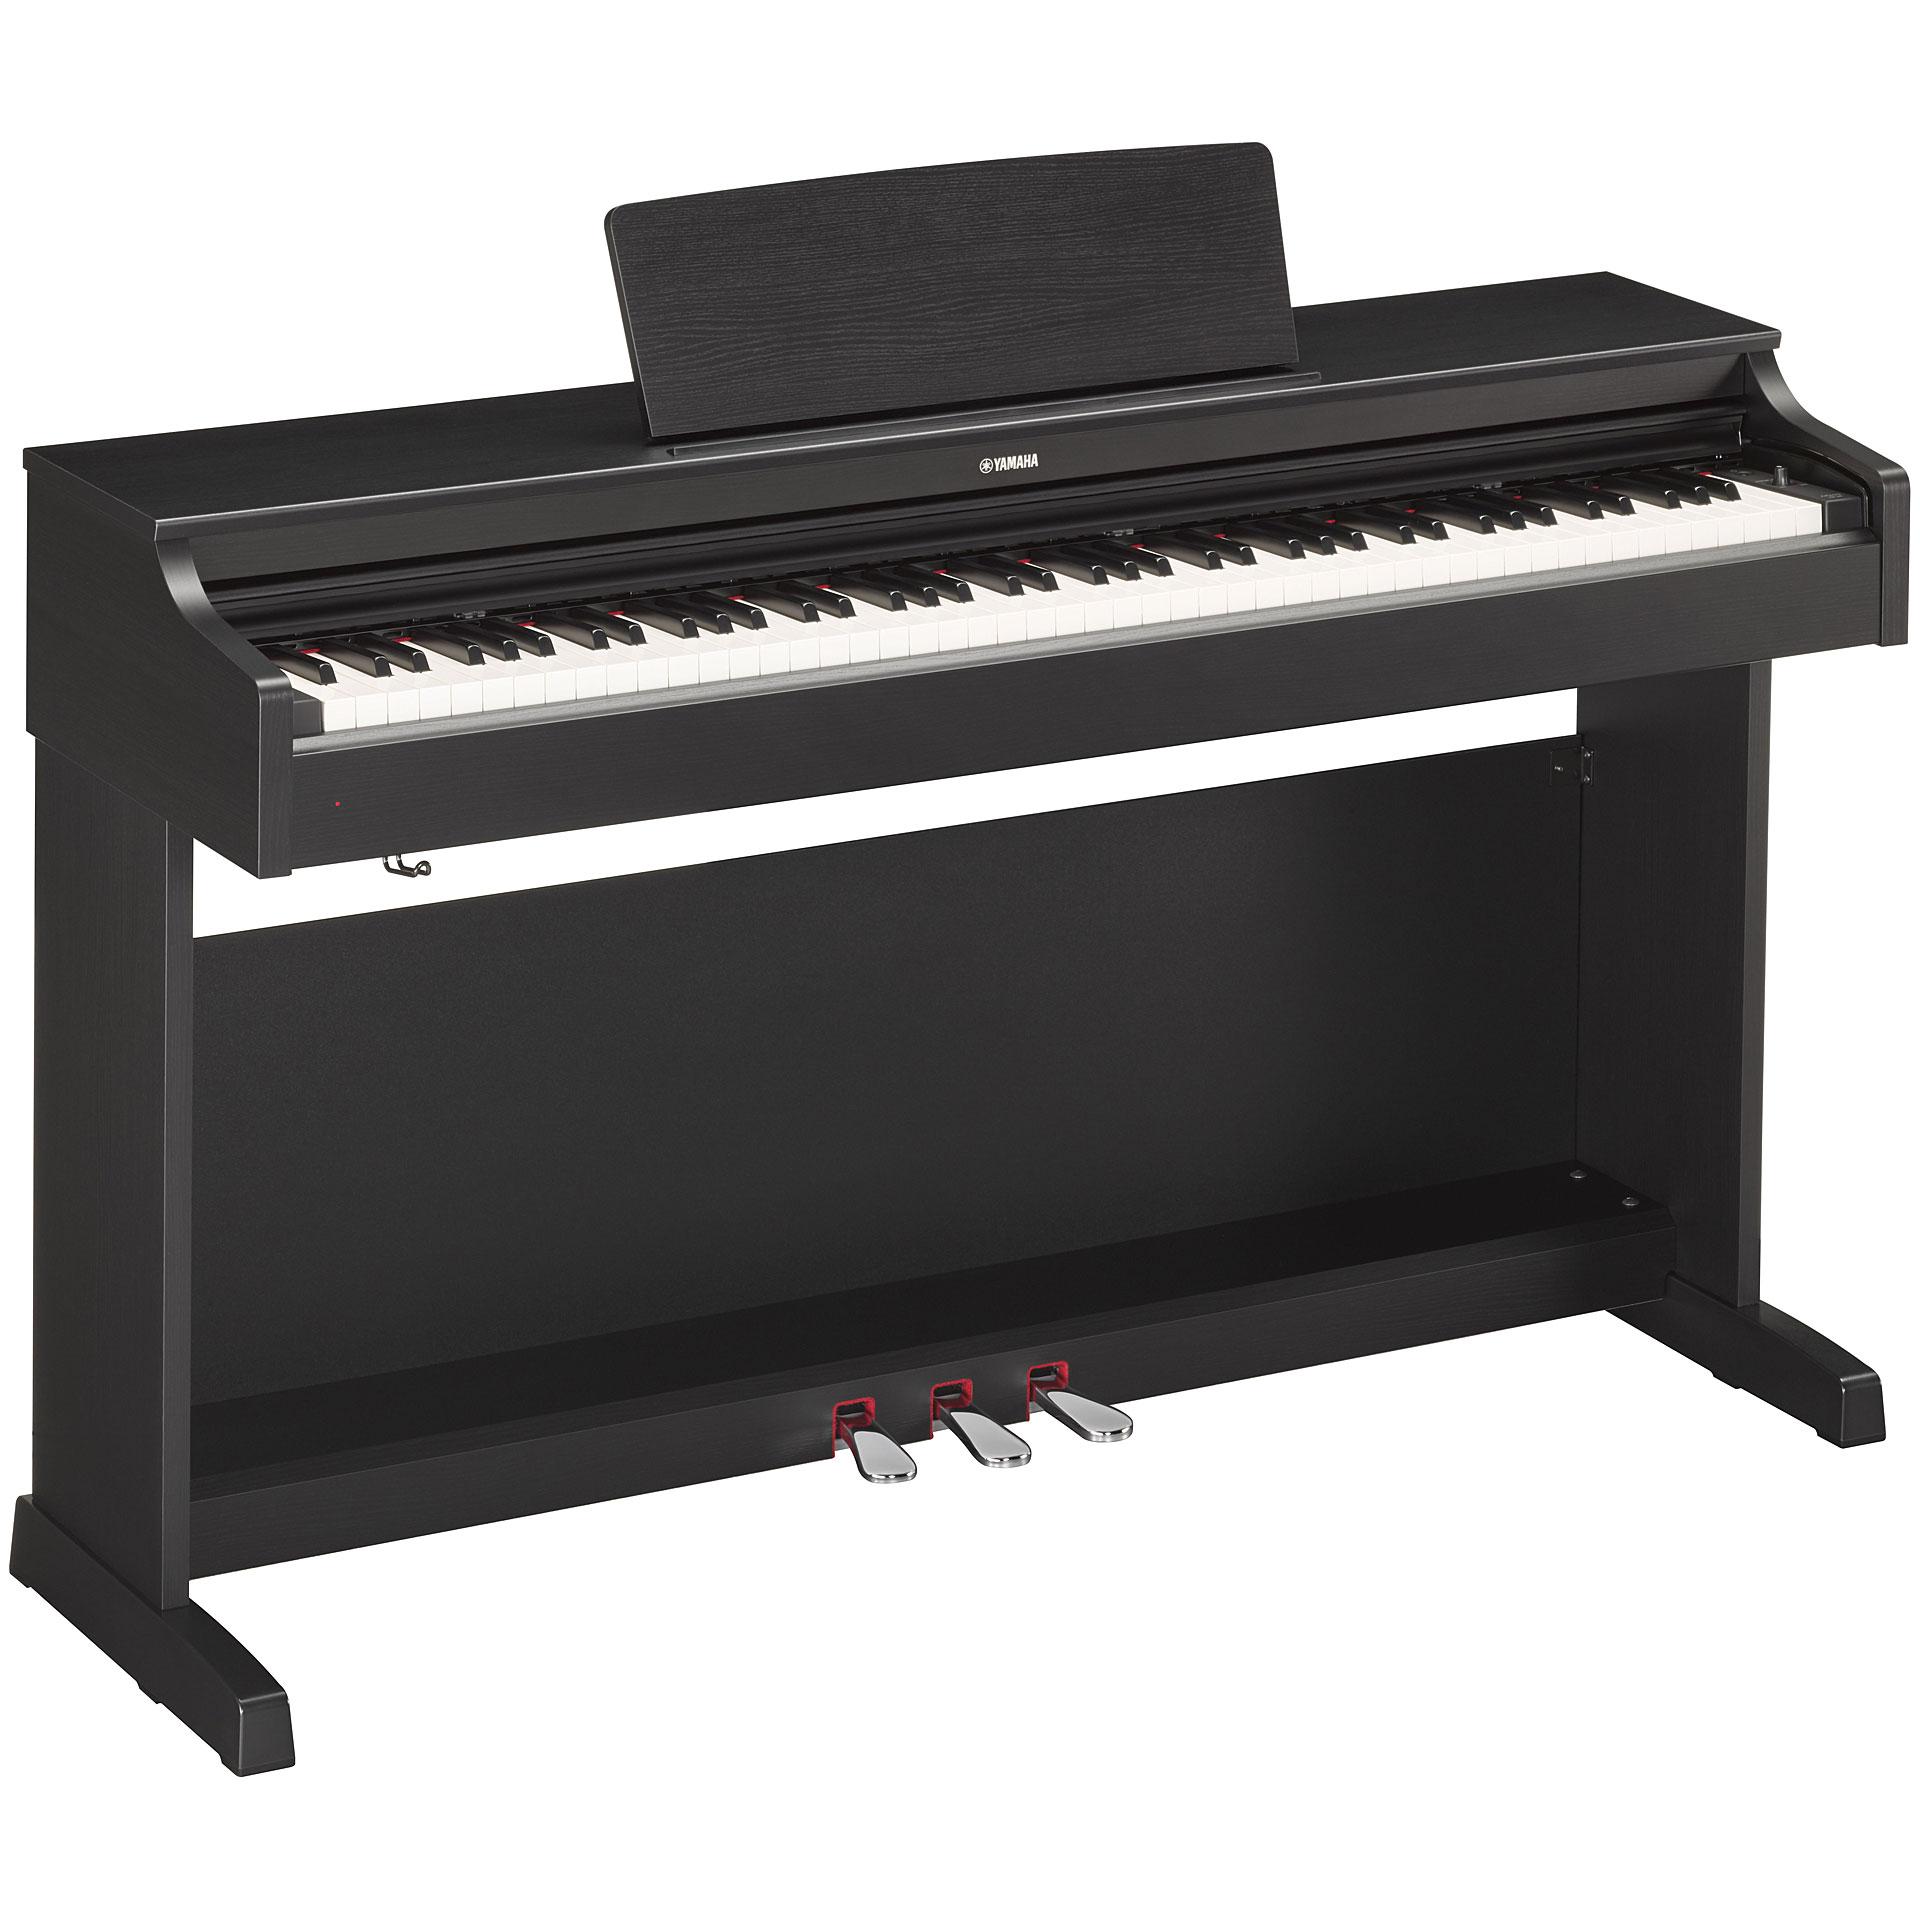 yamaha arius ydp 163 b digital piano. Black Bedroom Furniture Sets. Home Design Ideas